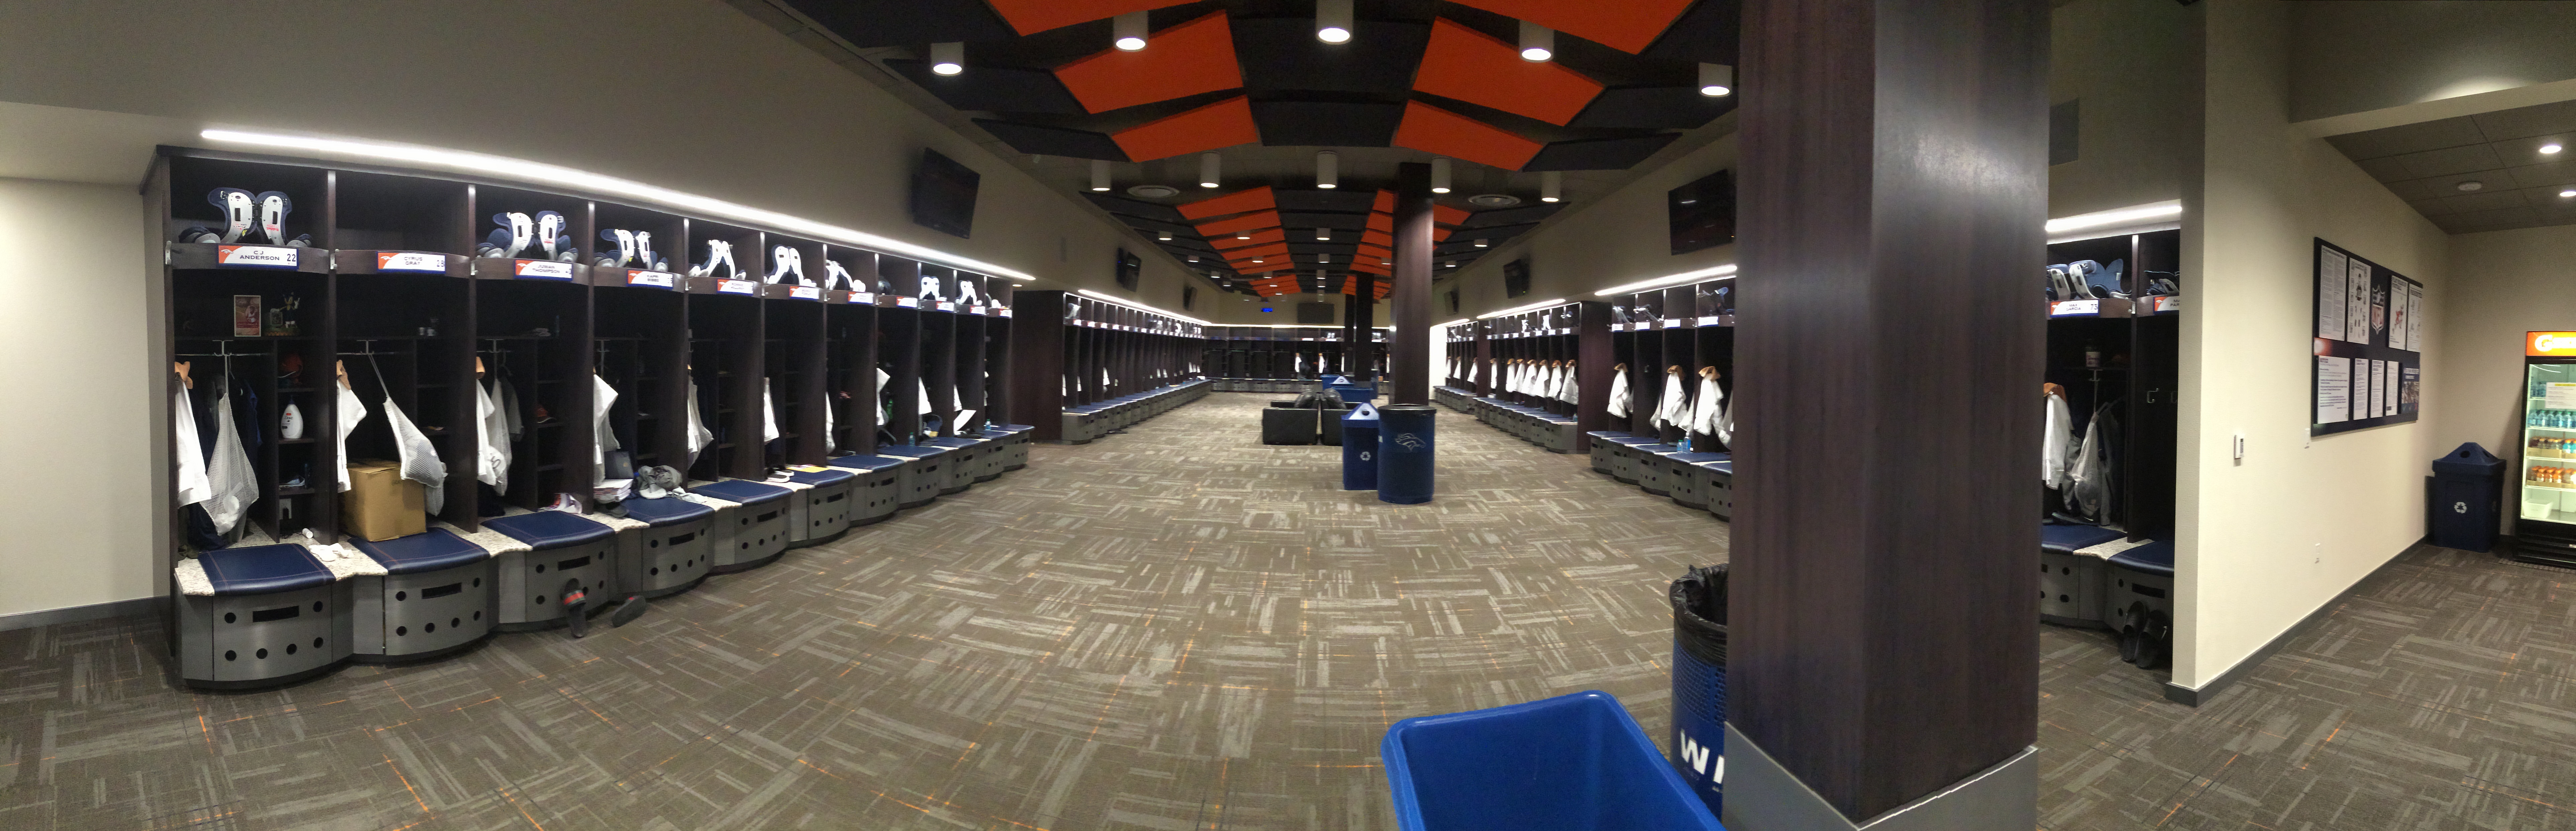 Broncos Locker Room A Quot Million Dollar Quot Renovation Project